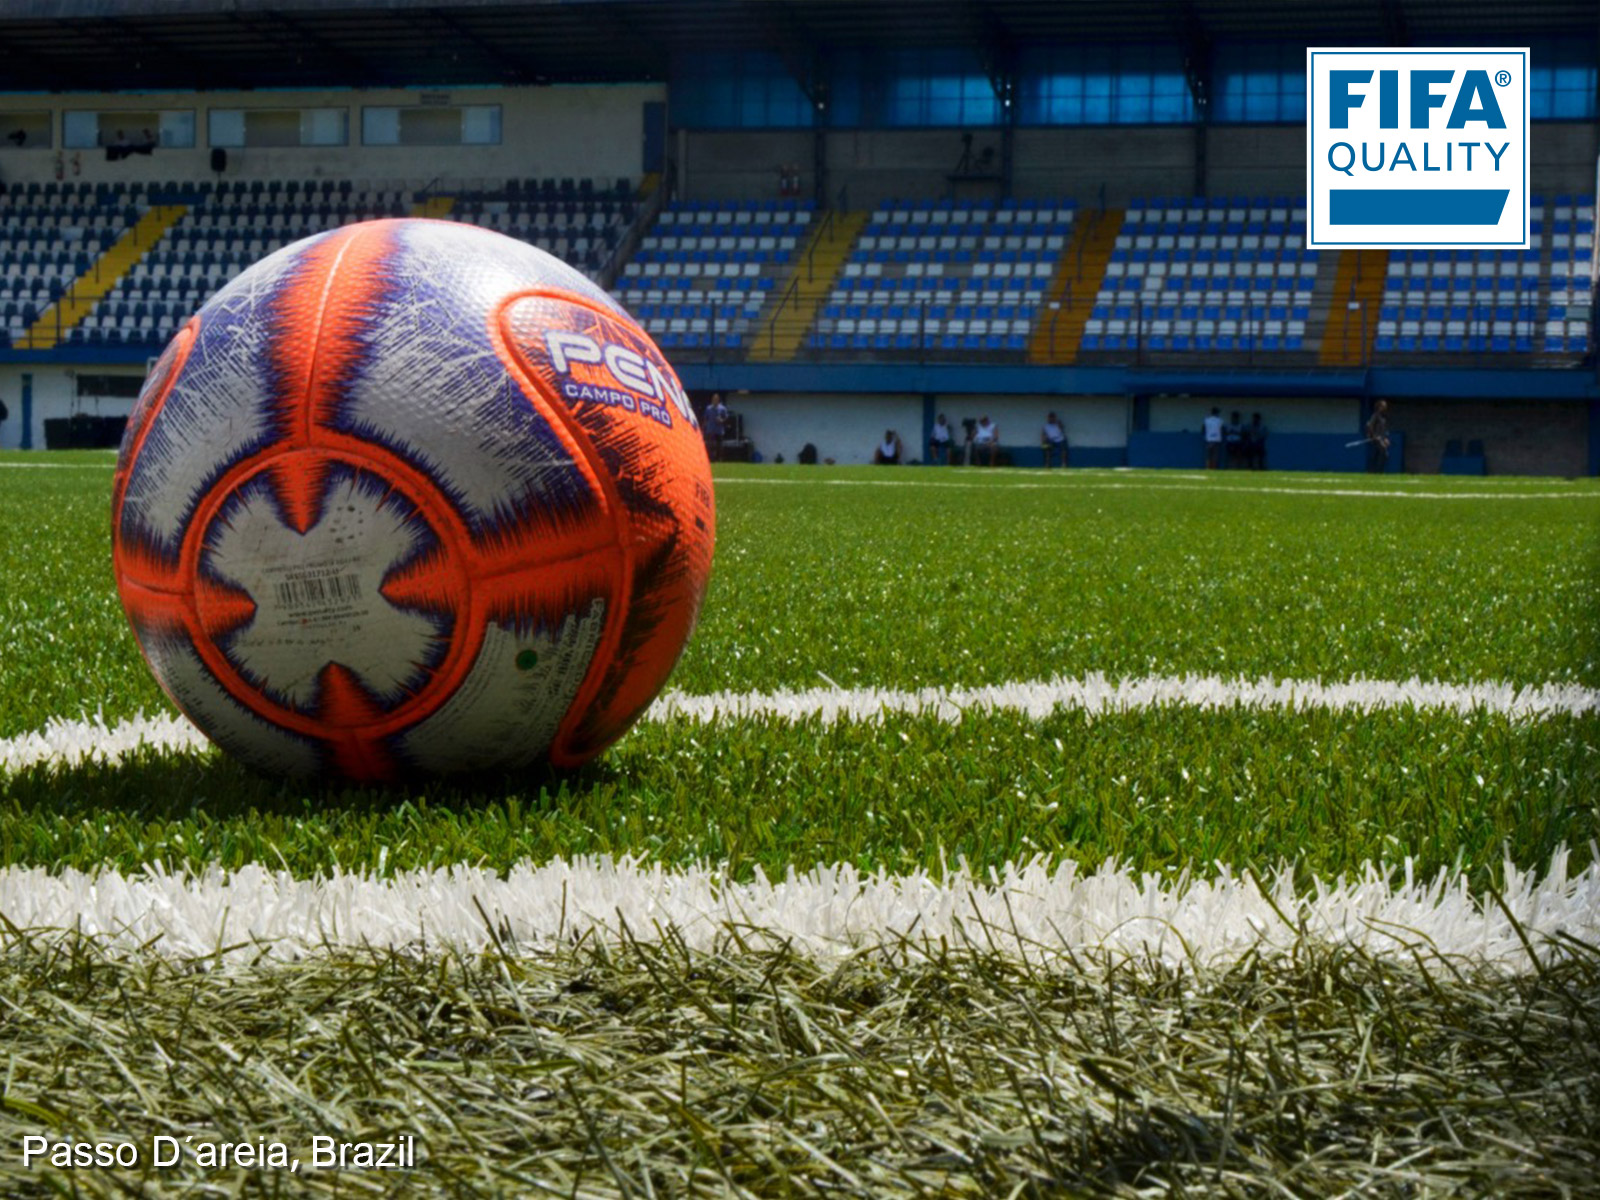 CCGrass, football field, FIFA certified field